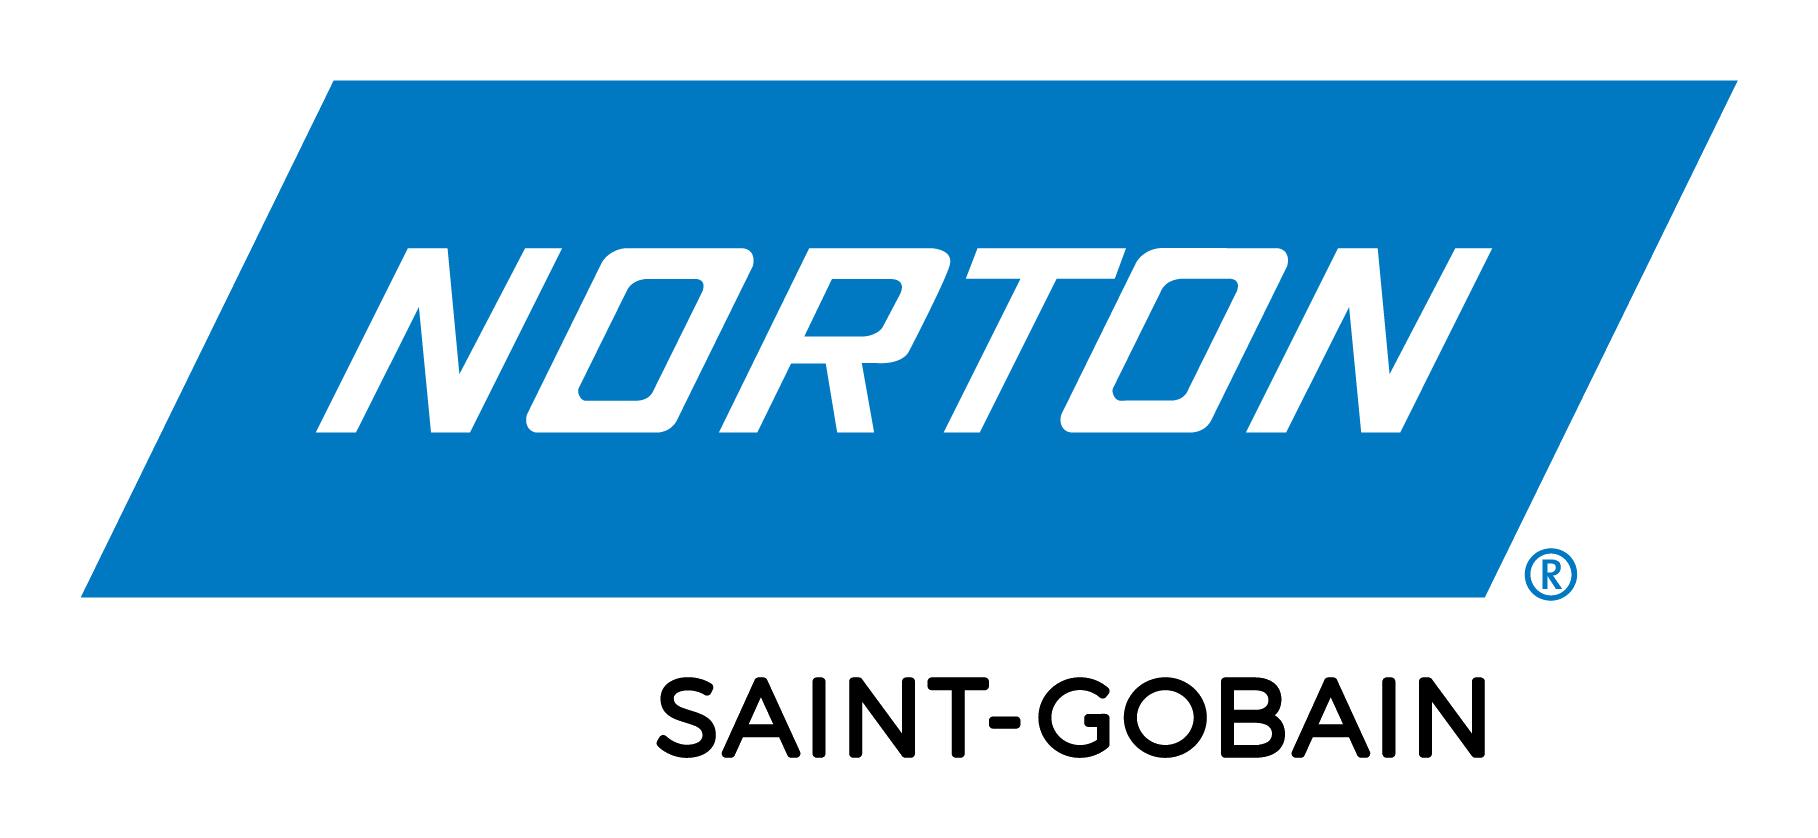 SG_Norton_logo_rgb_24